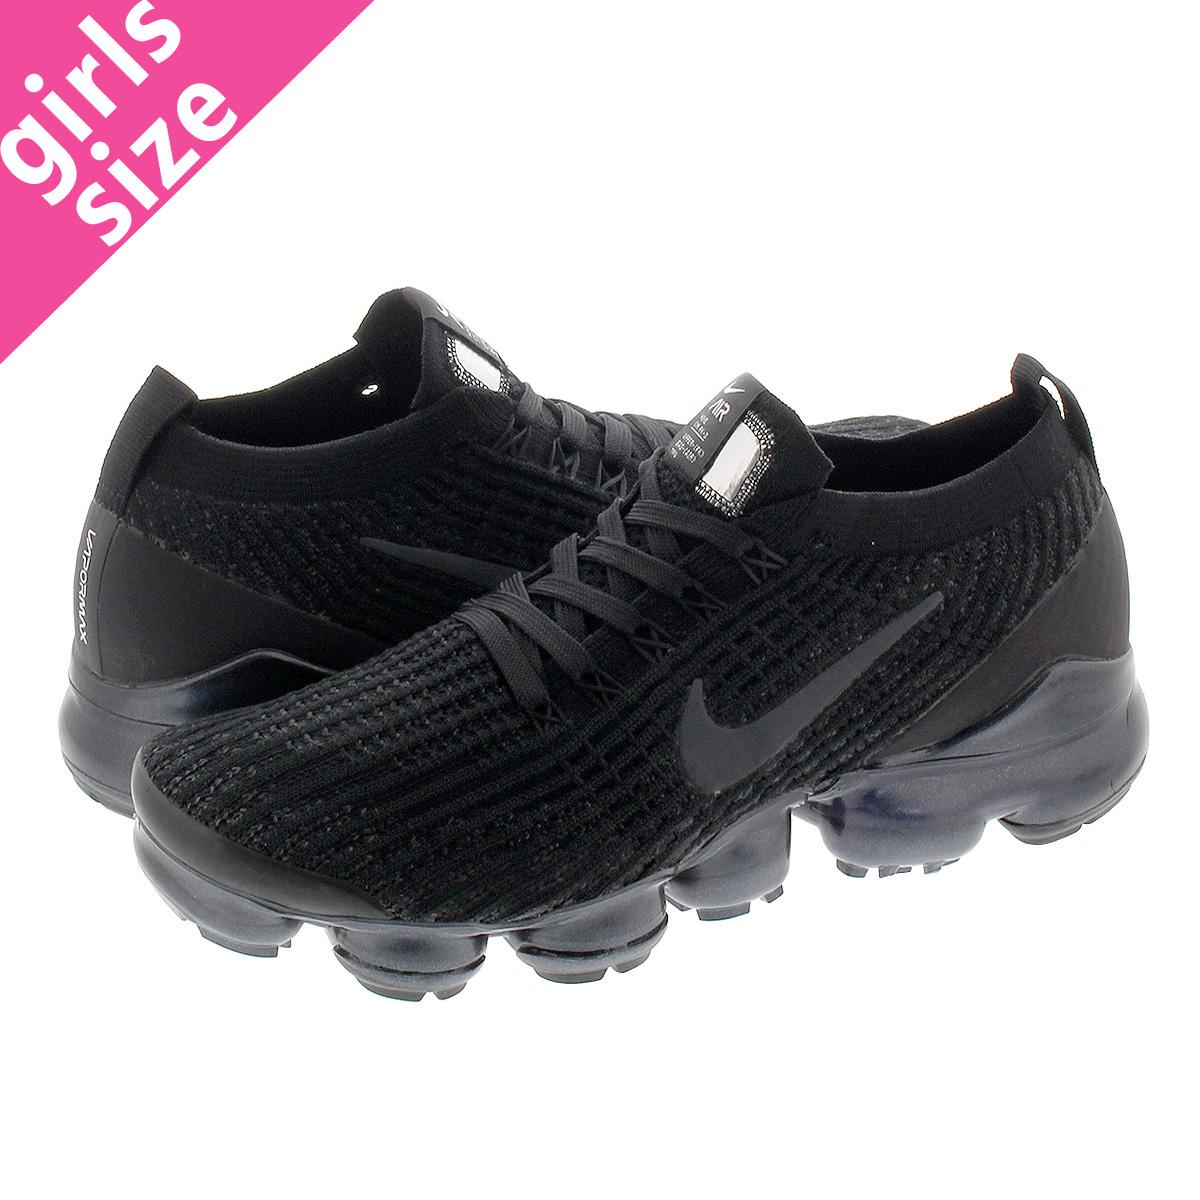 wholesale dealer 41f54 099ee NIKE WMNS AIR VAPORMAX FLYKNIT 3 Nike women vapor max fried food knit 3  BLACK/ANTHRACITE/WHITE aj6910-002